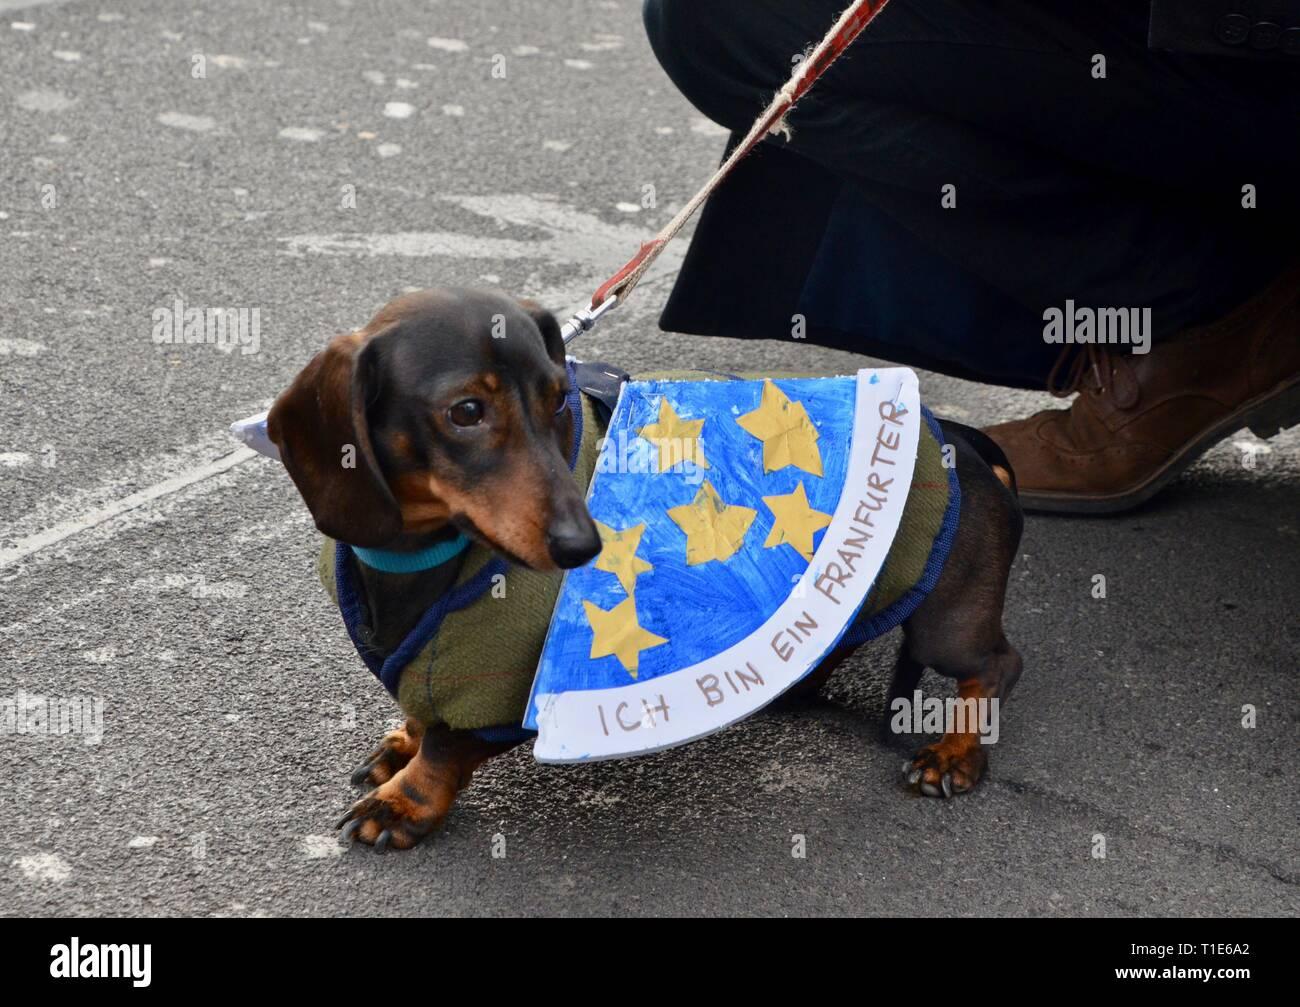 scenes from the anti brexit pro peoples vote march in london 23rd march 2019 daschund dog ich bin ein frankfurter - Stock Image